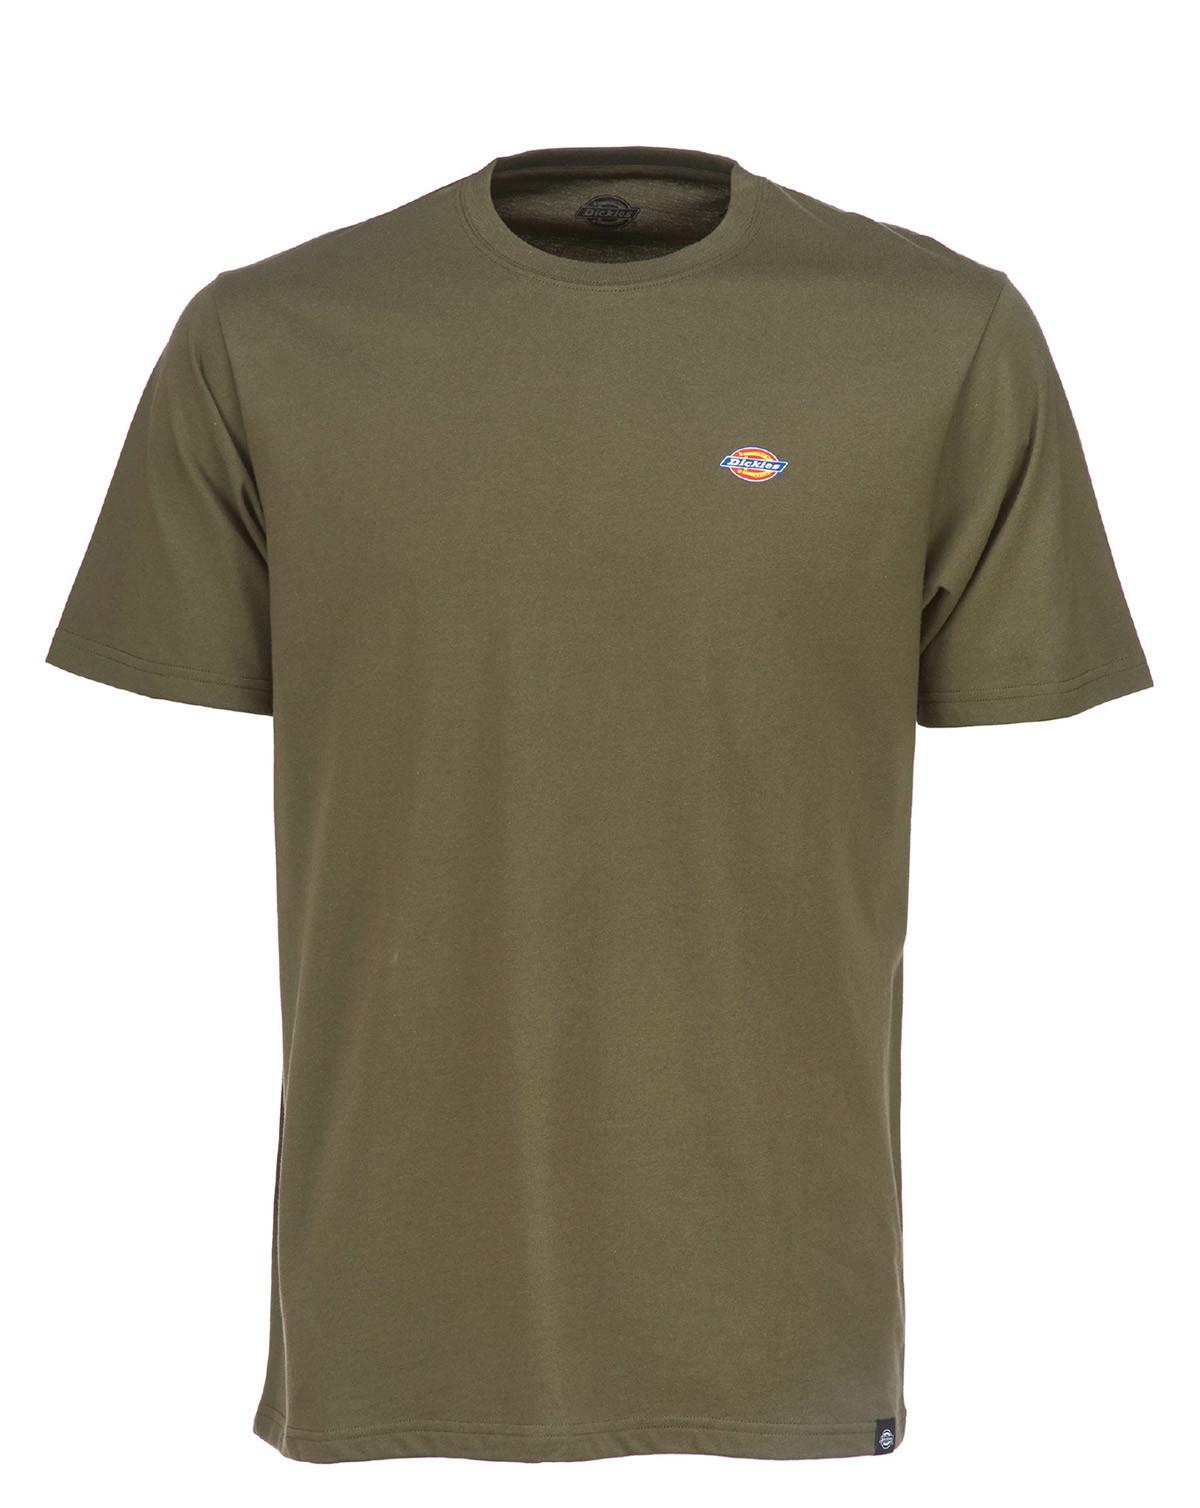 Dickies Stockdale T-shirt (Dark Olive, XXS)